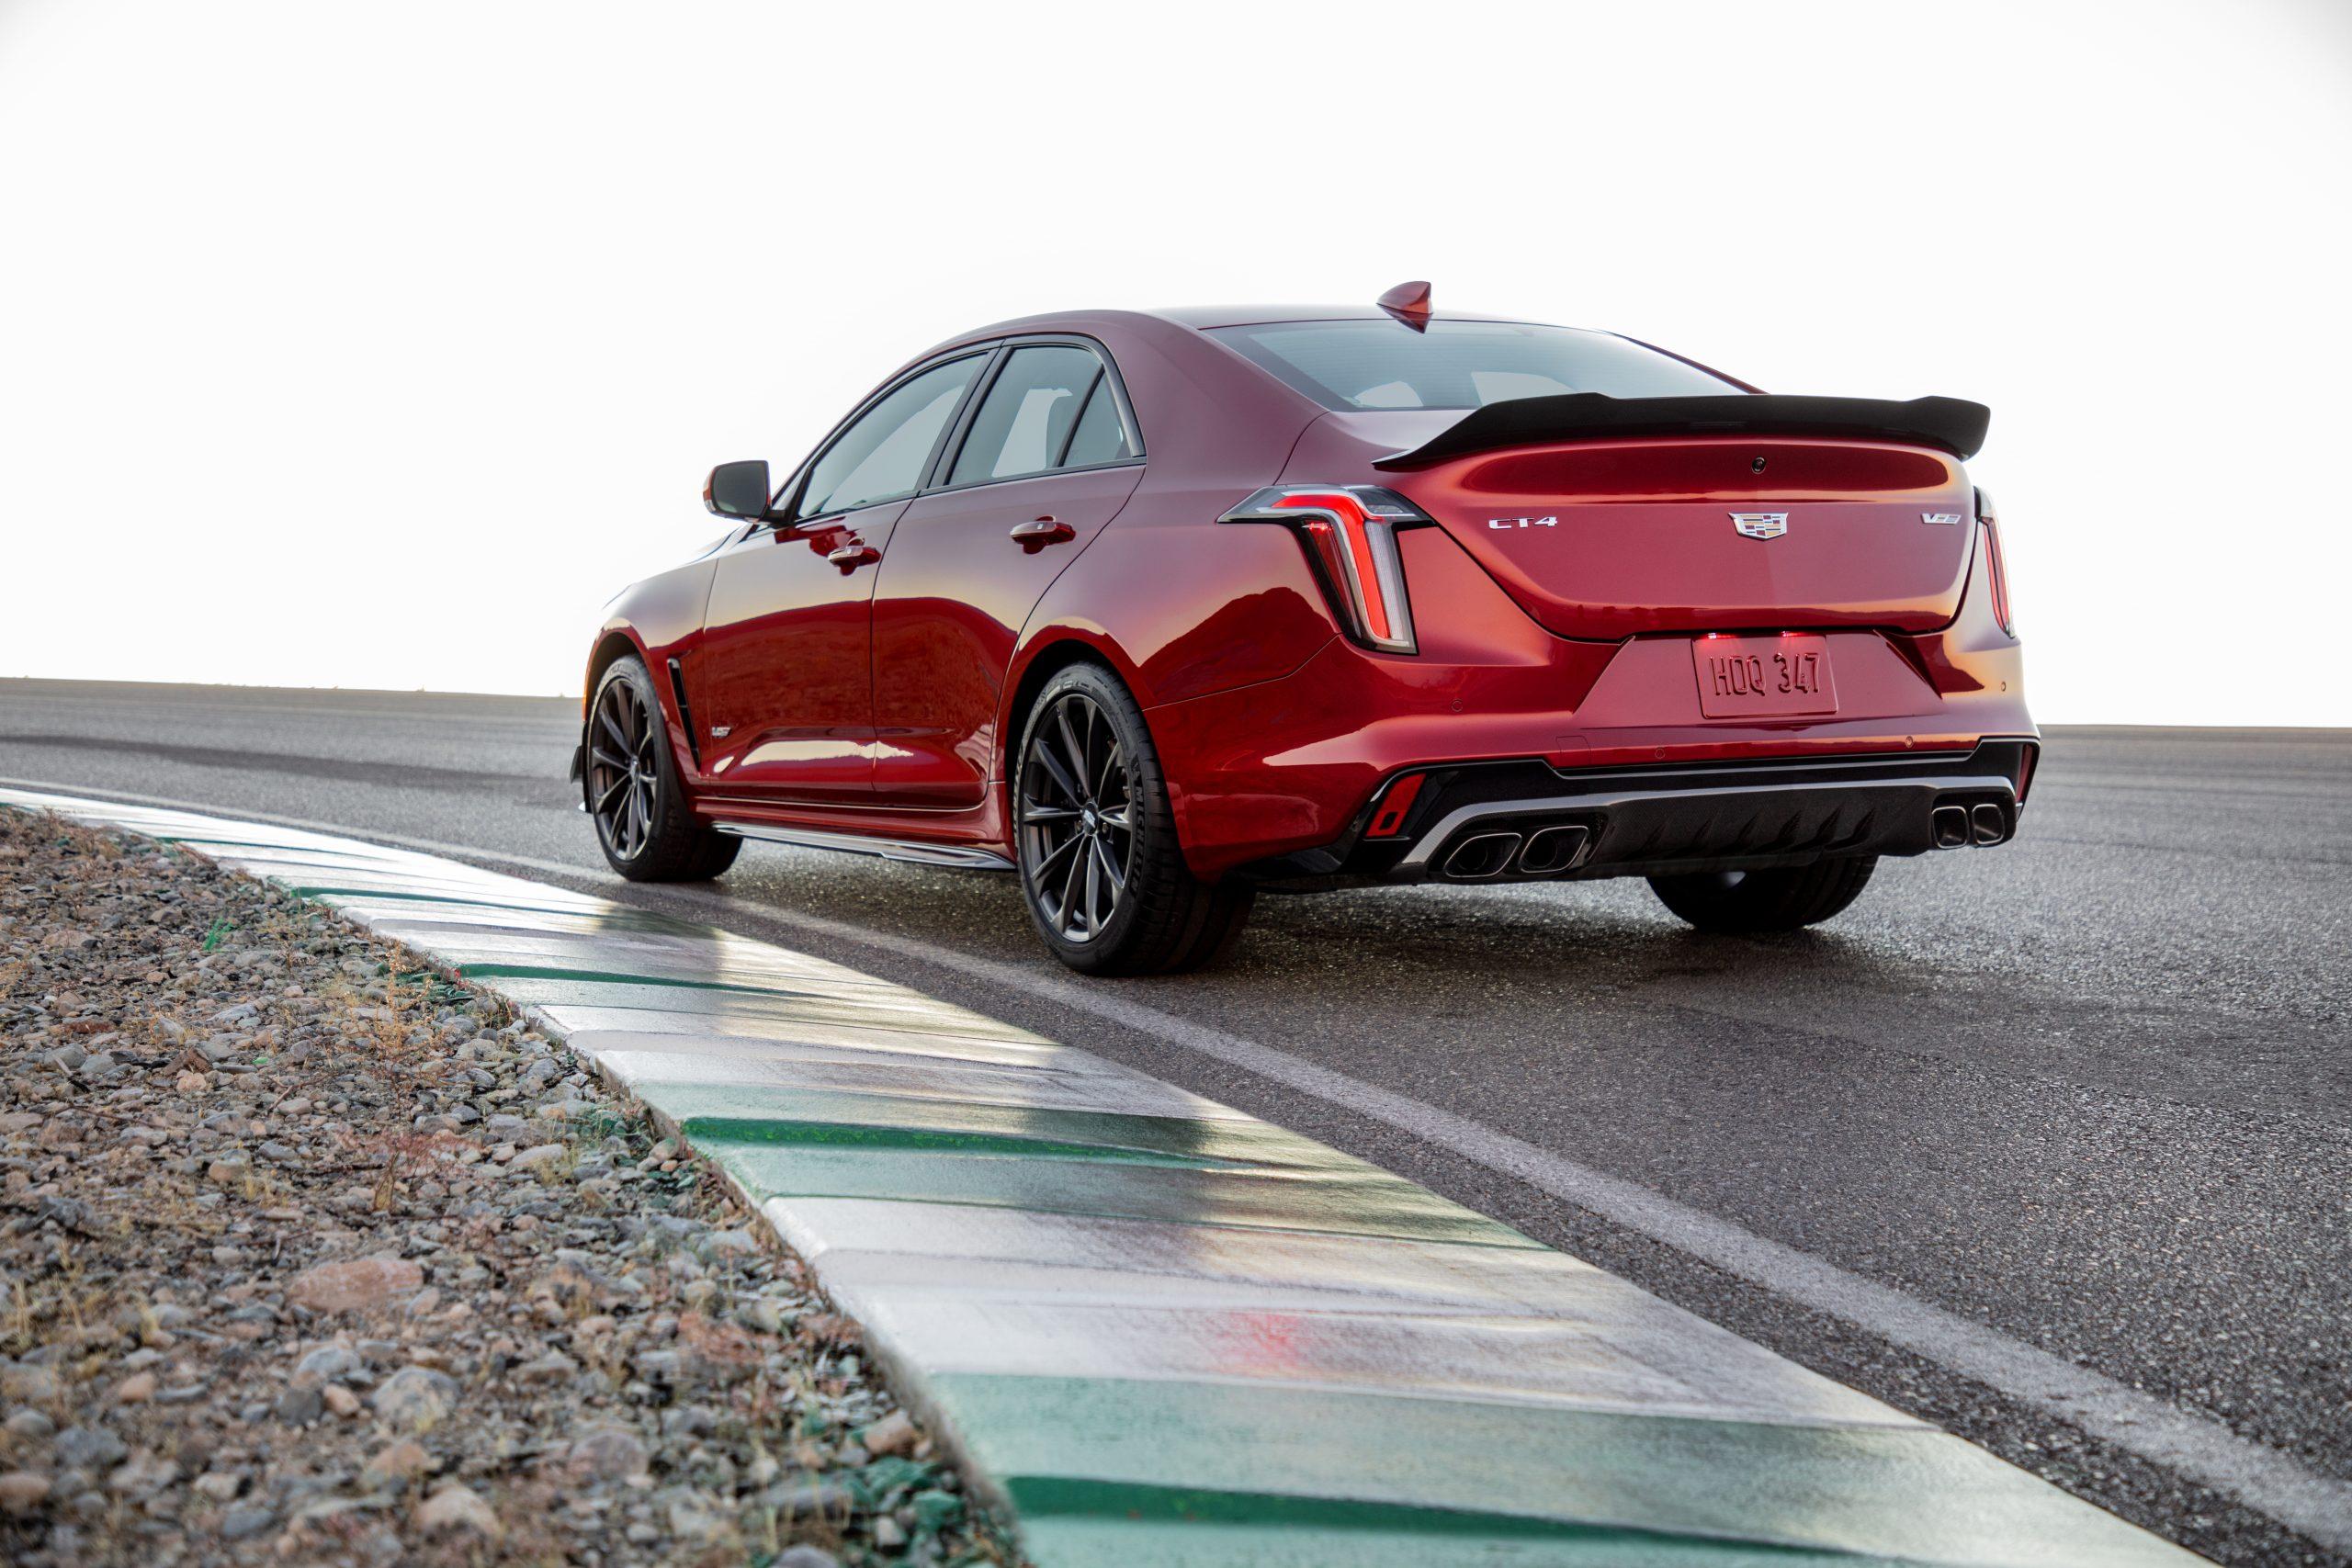 2022 Cadillac CT4-V Blackwing rear three quarter